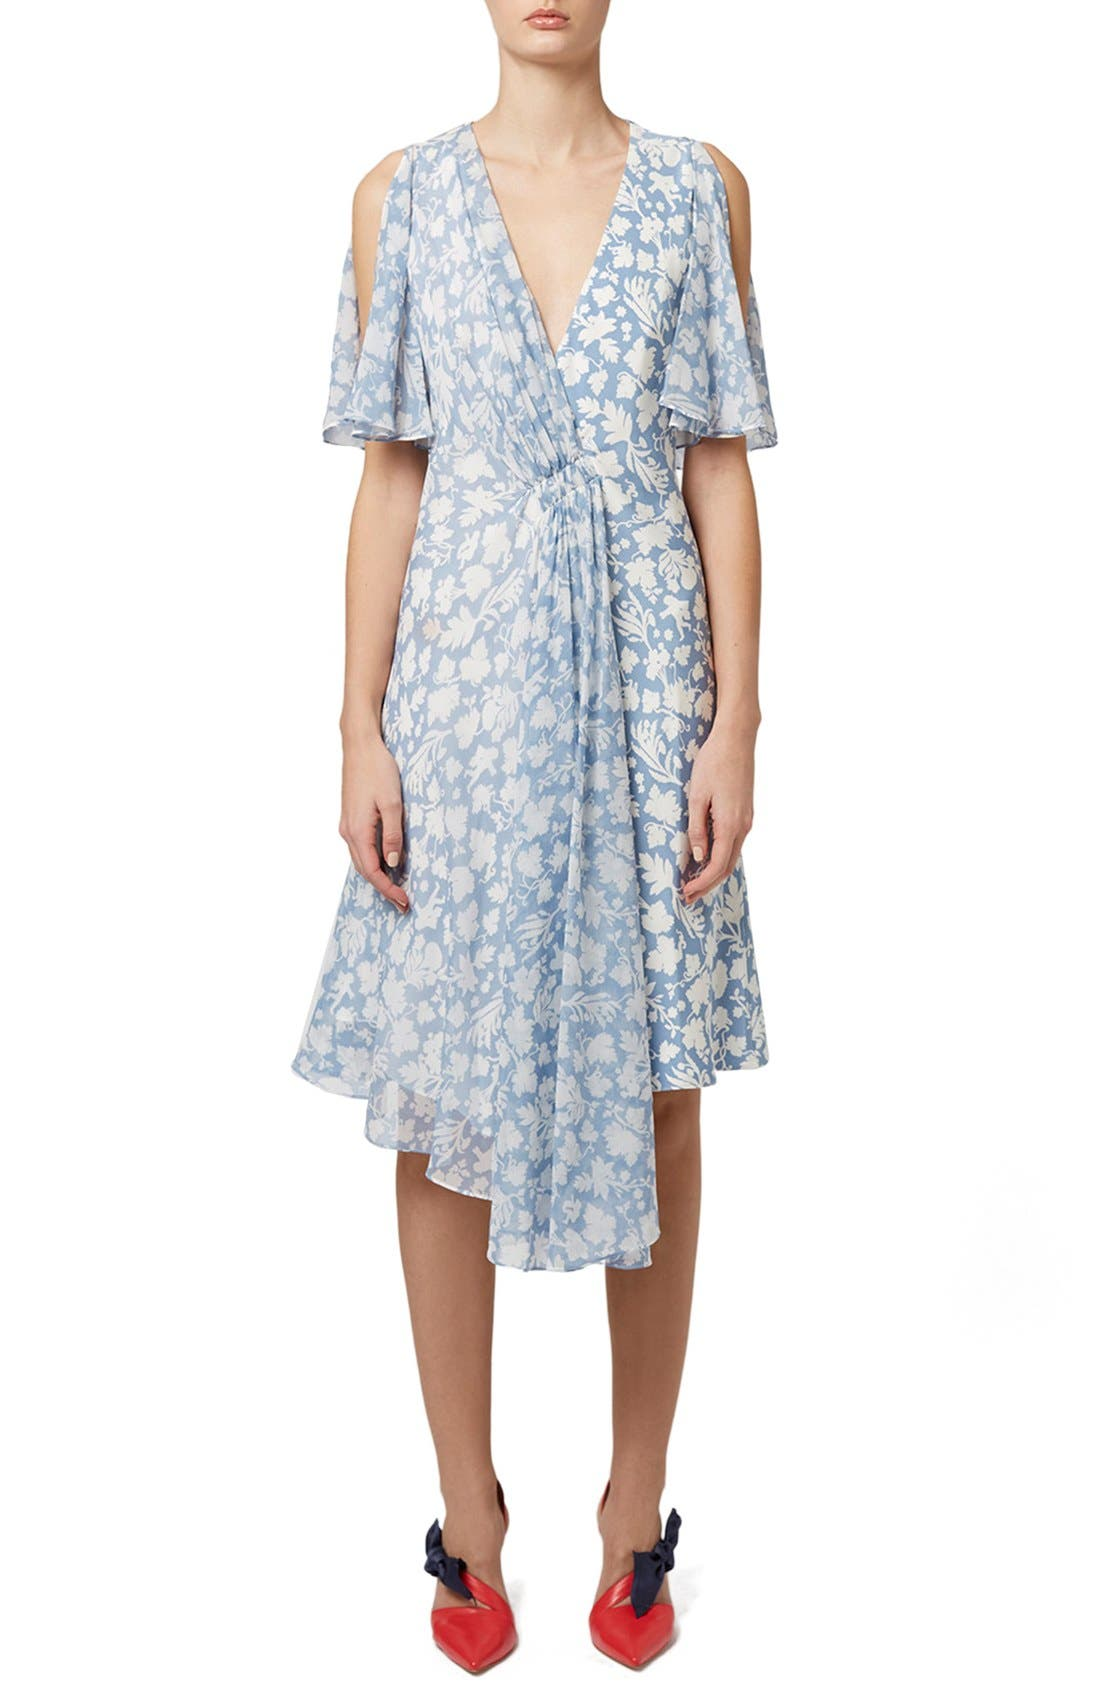 Alternate Image 1 Selected - Topshop Unique 'Belfour' Floral Print Silk Dress